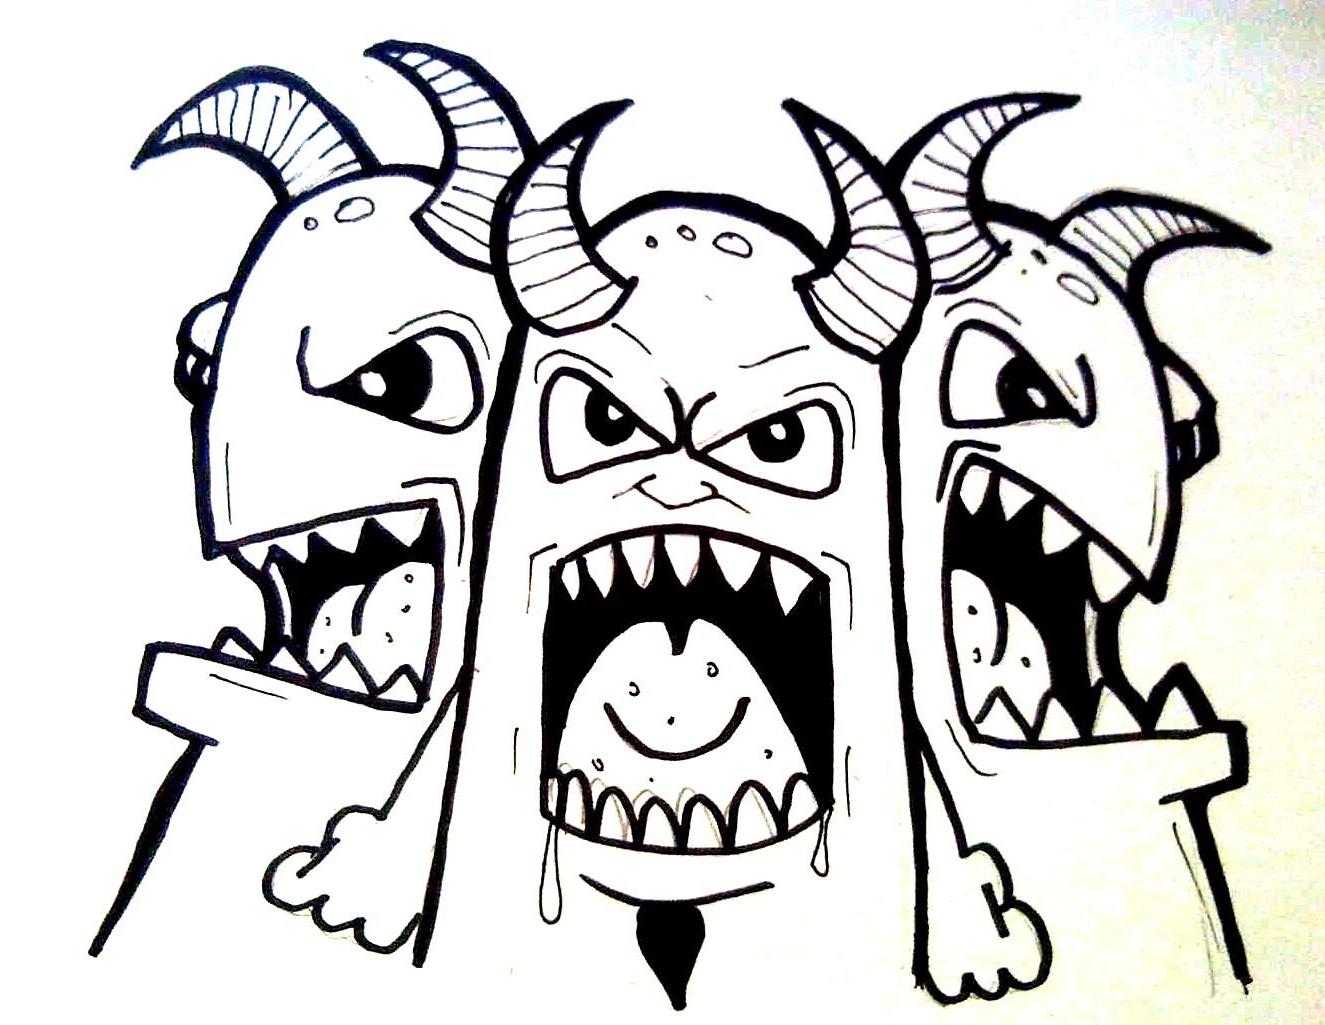 1325x1025 Graffiti Character Monster Sketch 3d Graffiti Character Monster